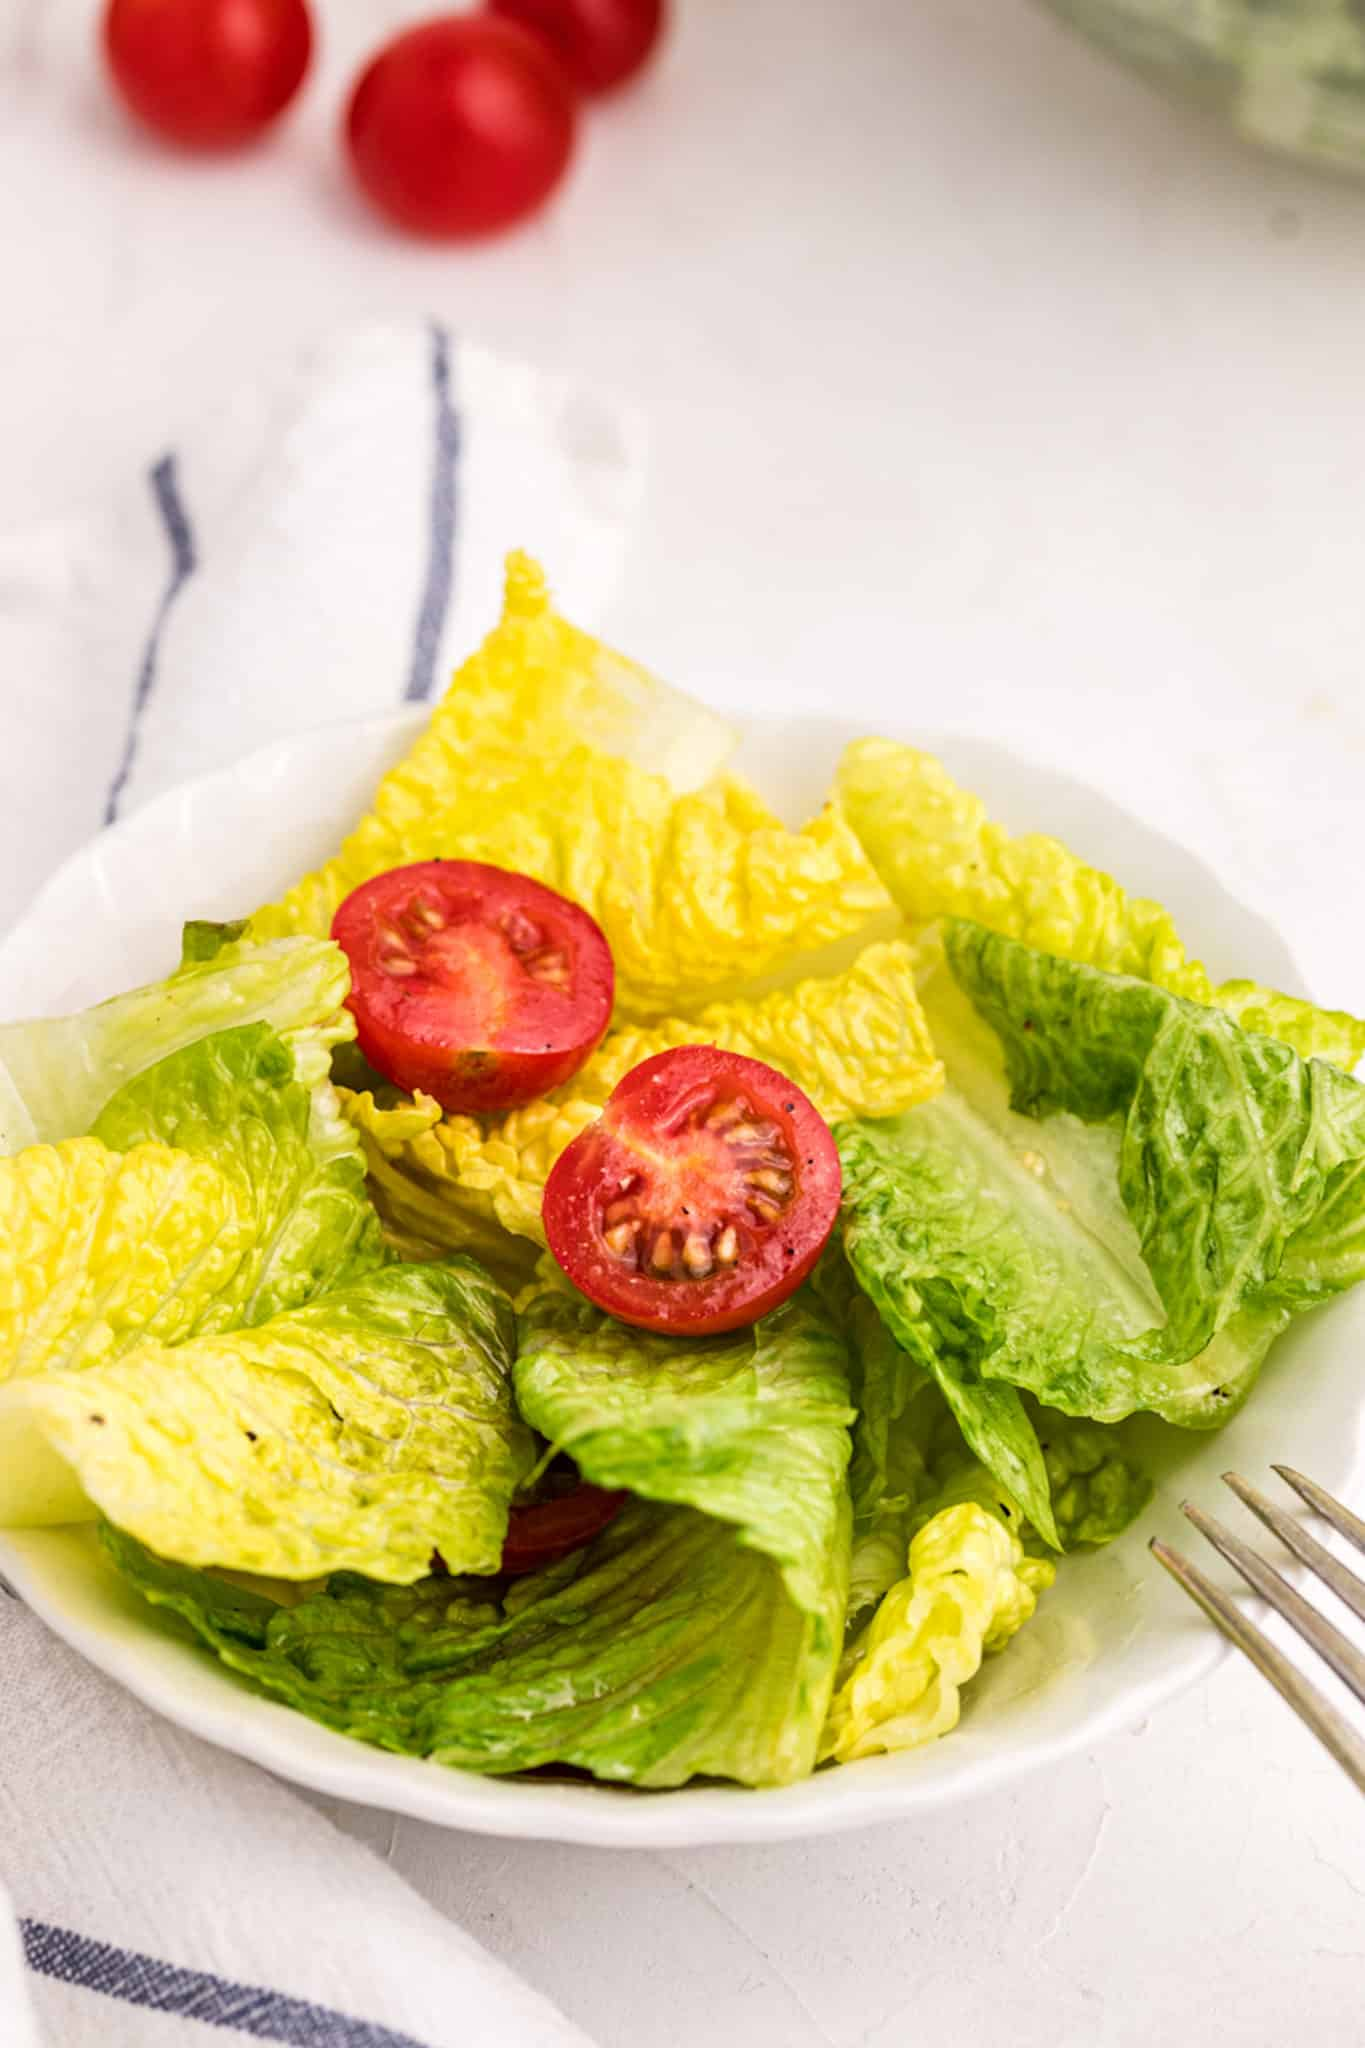 romaine salad with cherry tomatoes